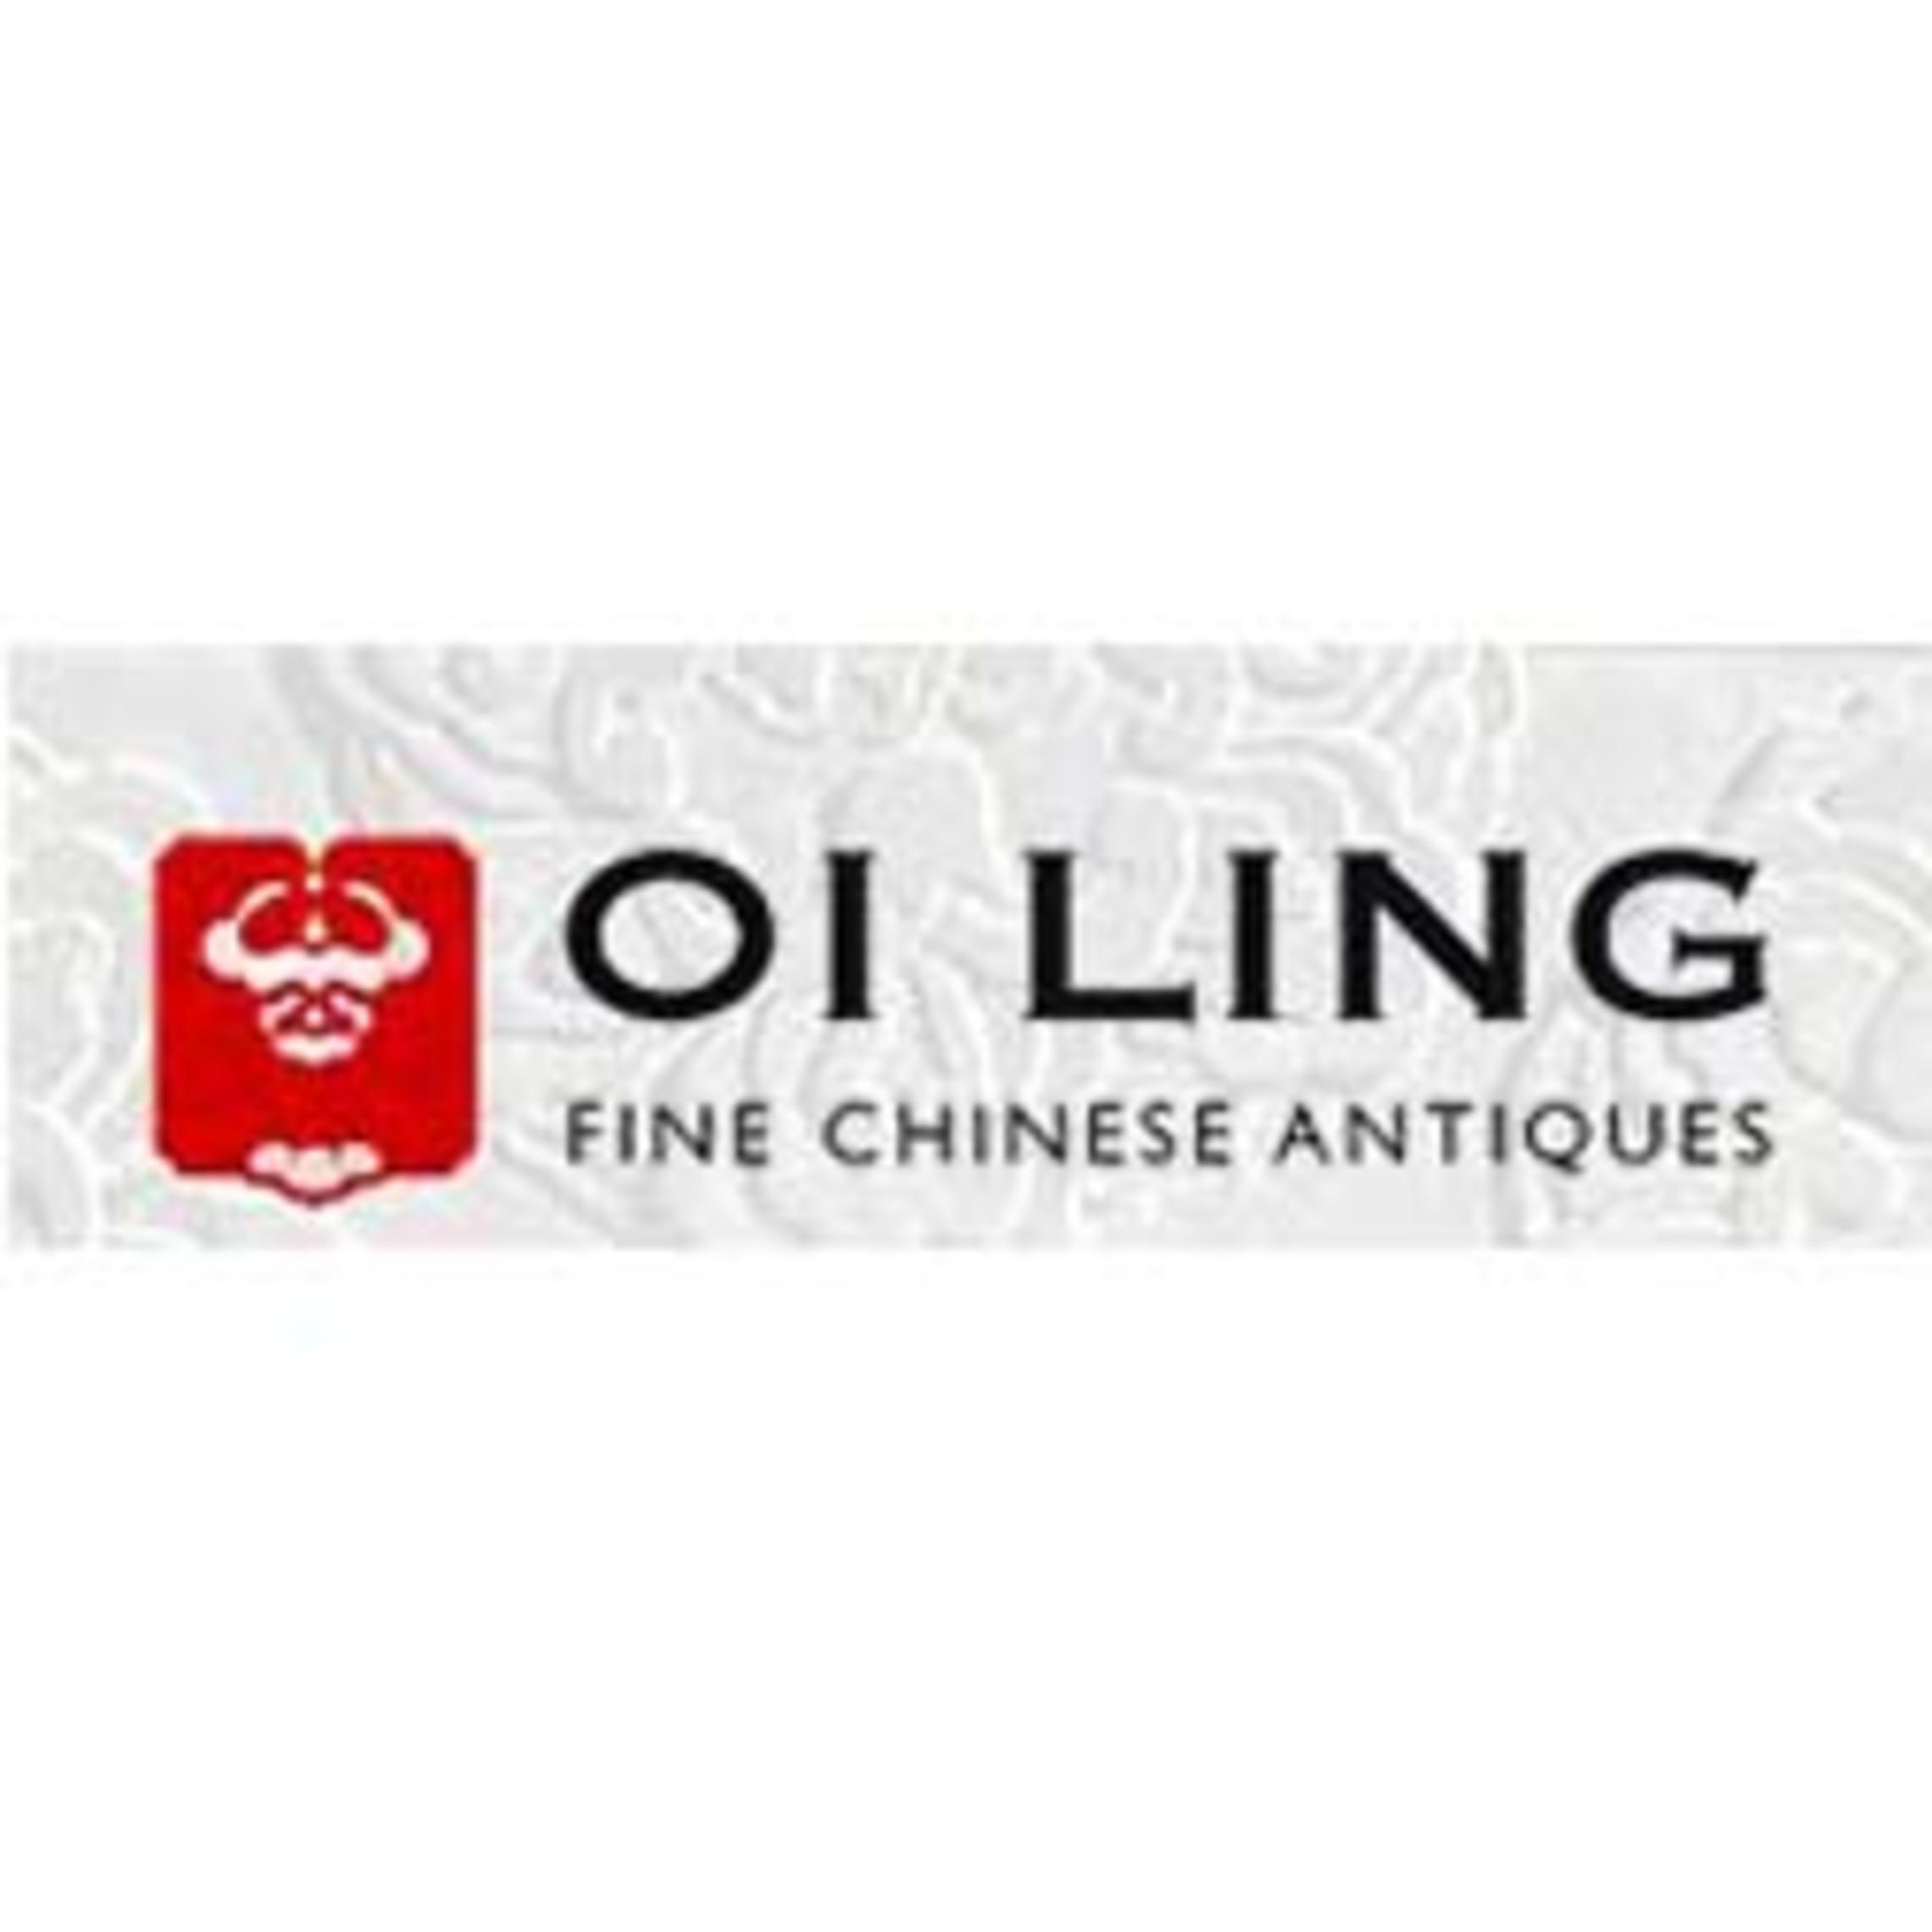 oi ling fine- company logo